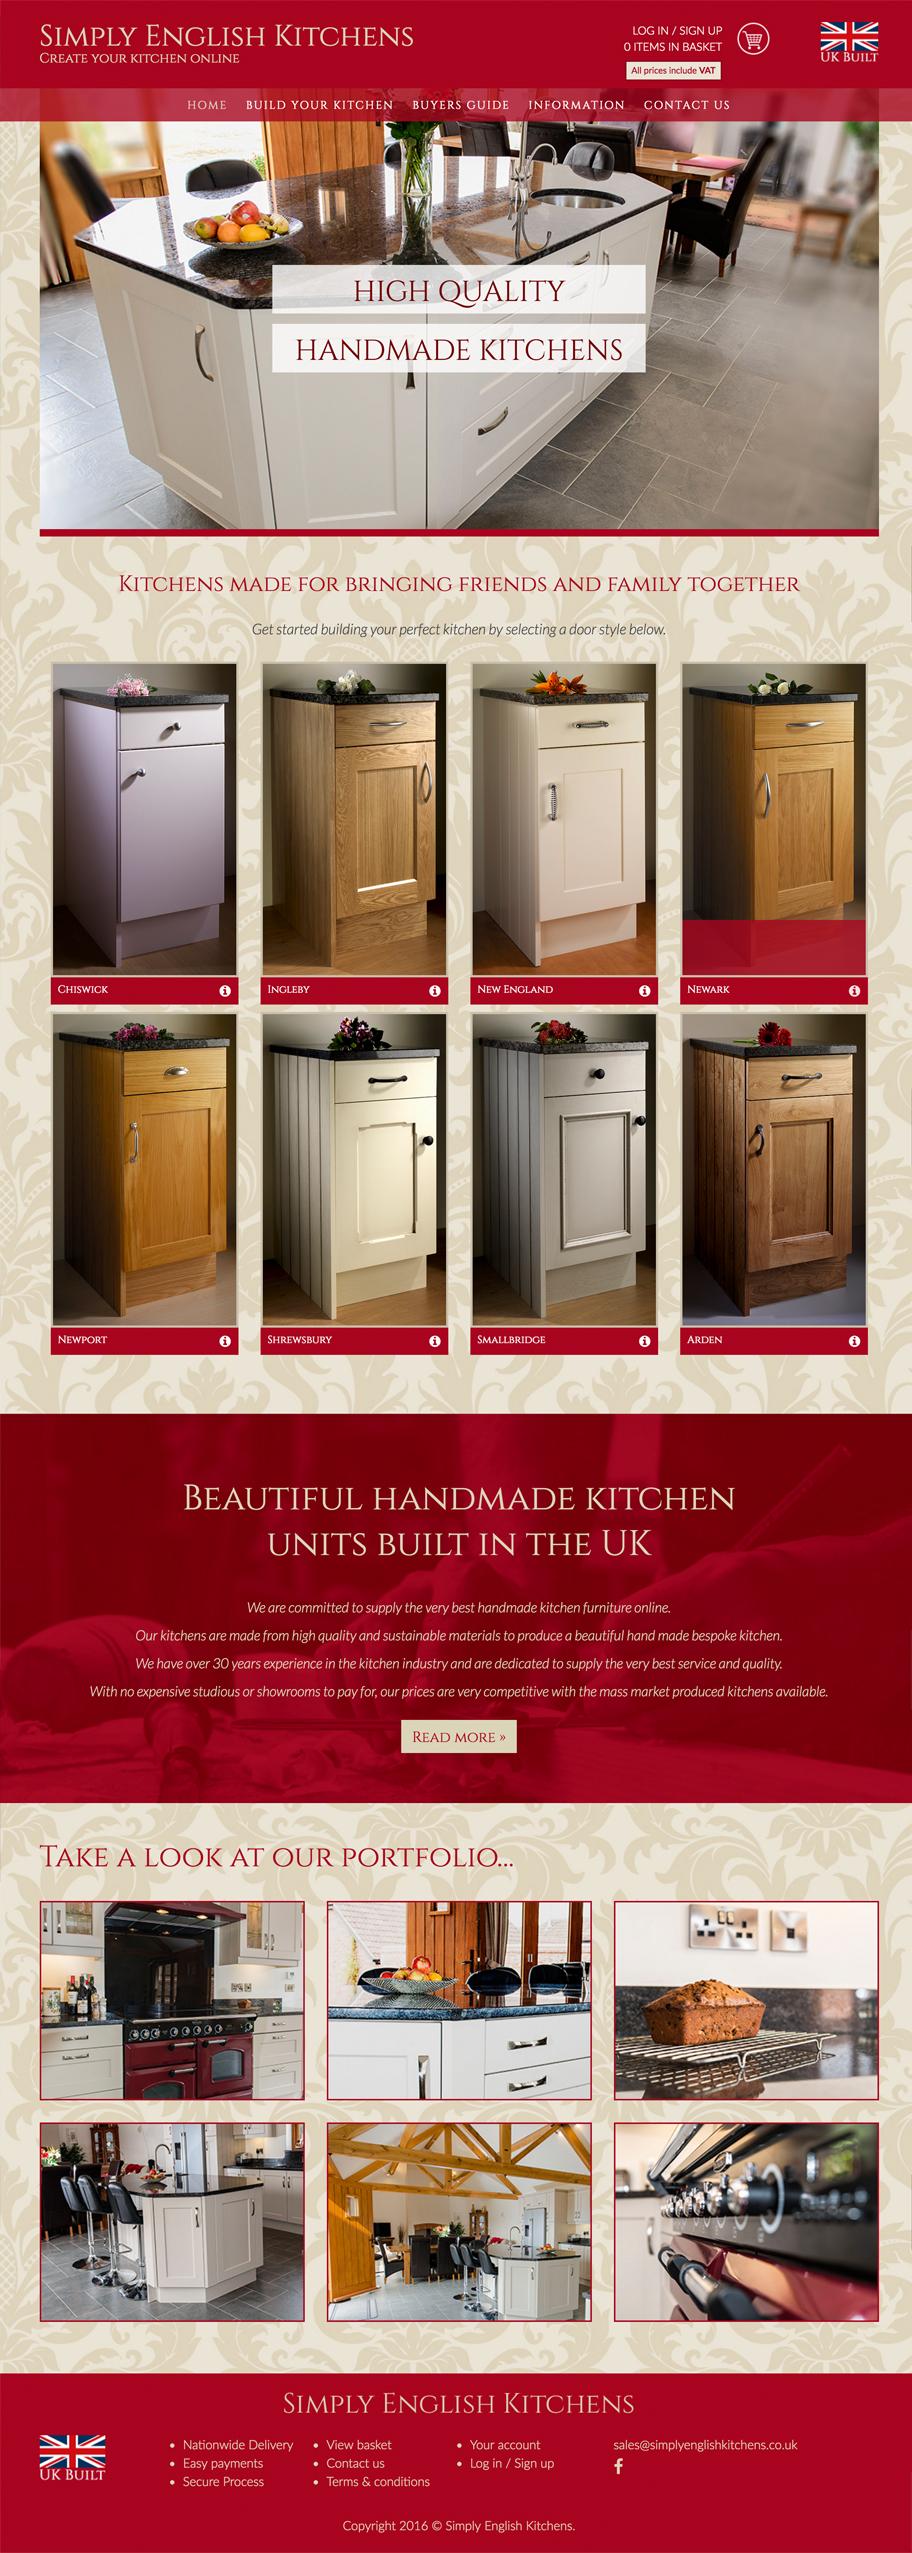 Simply English Kitchens